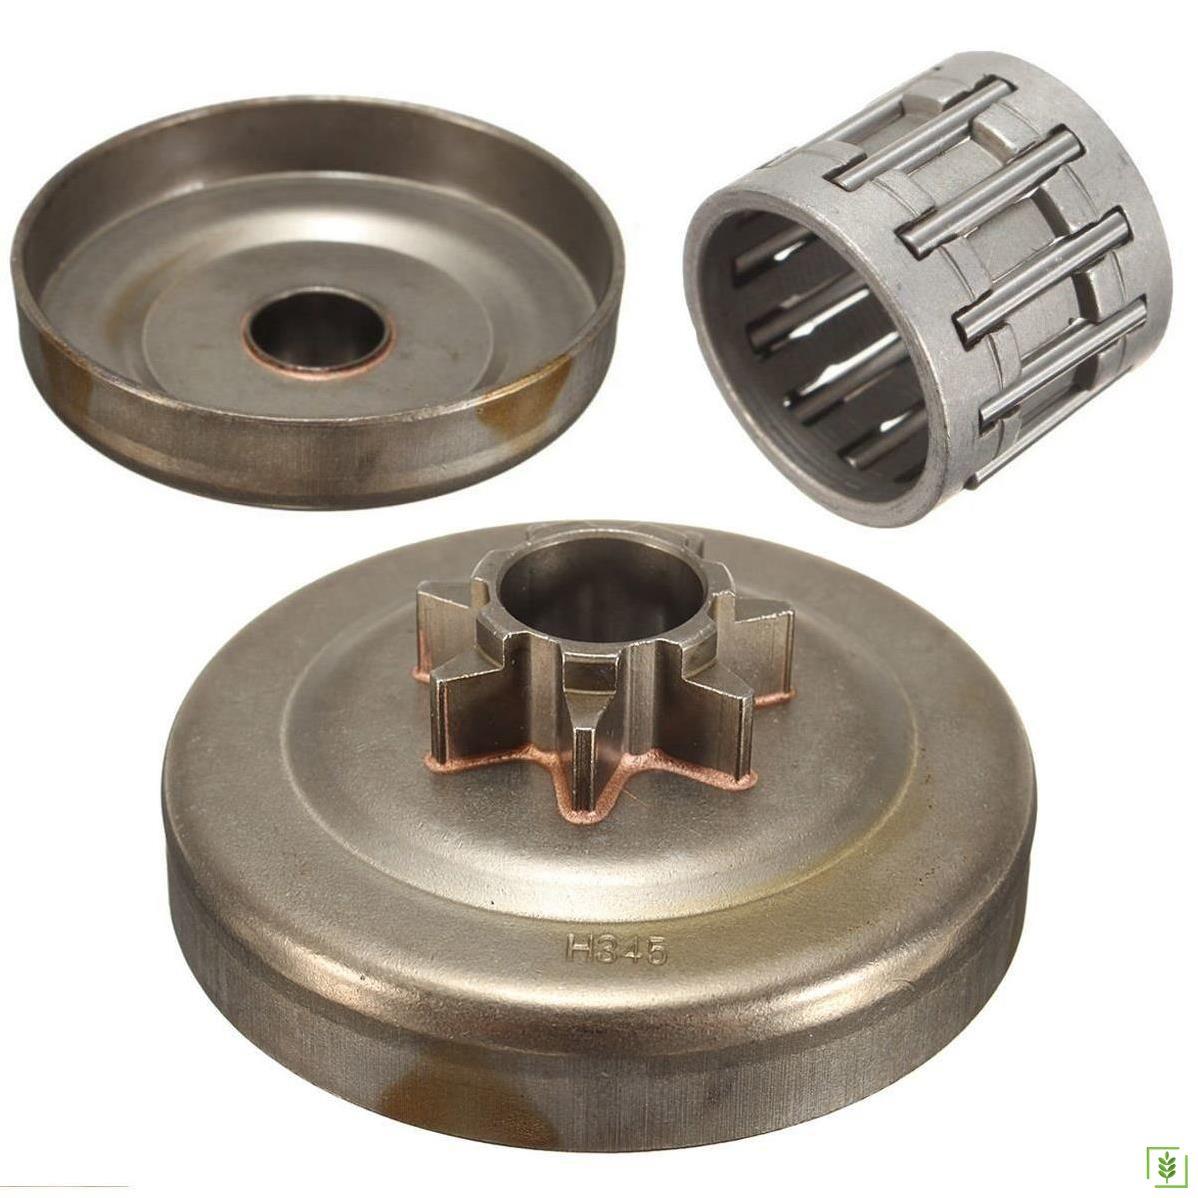 İtal Zincir Dişlisi Sabit - Ms 170 / Ms 180 / Ms 210 / Ms 230